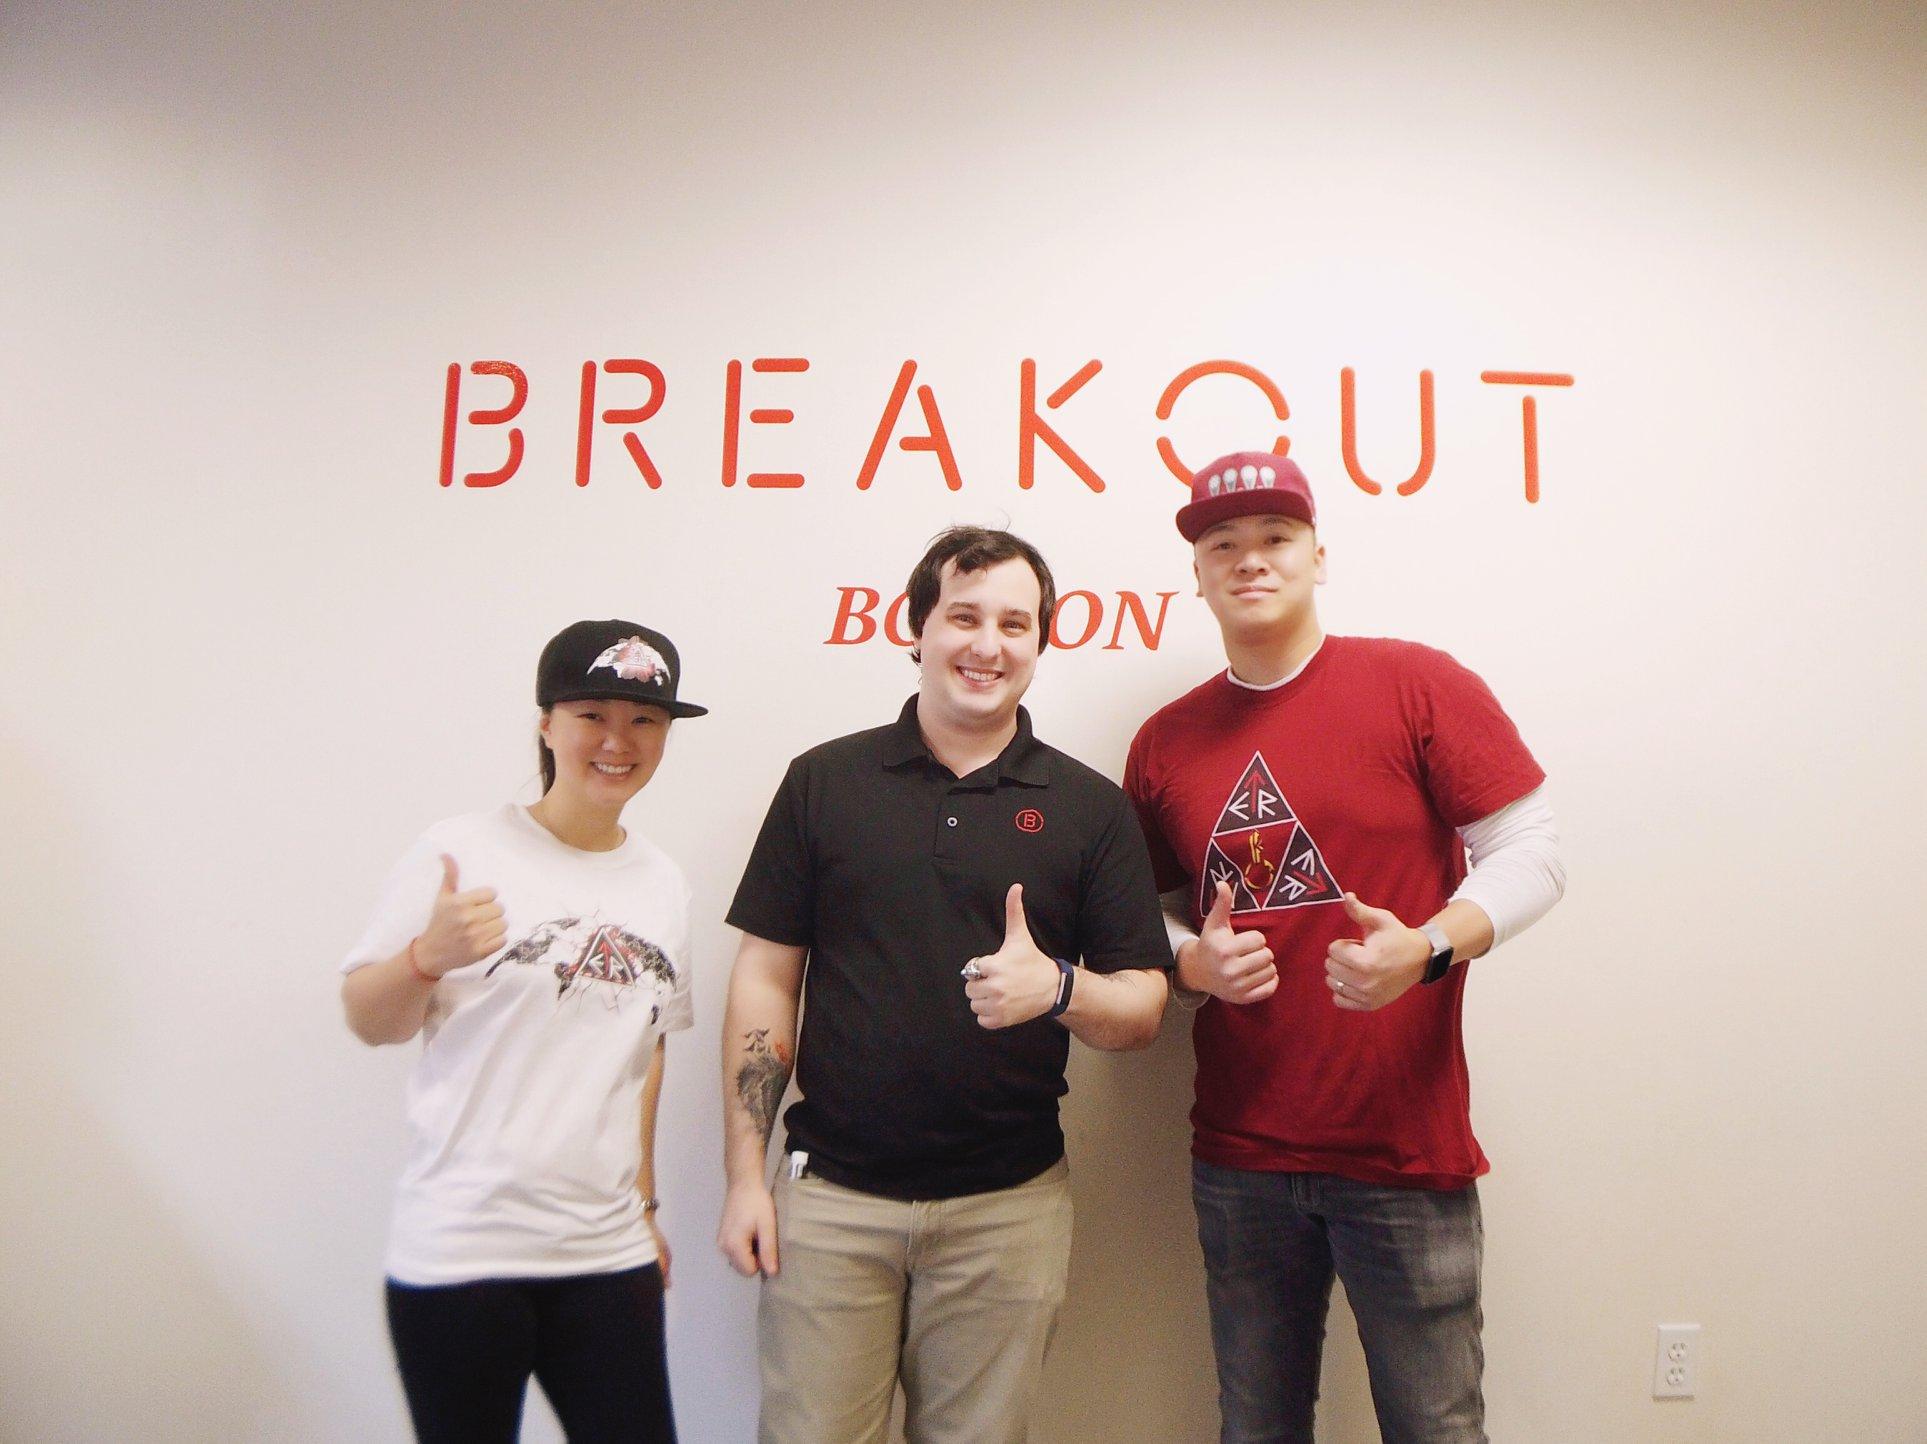 Breakout Games Woburn